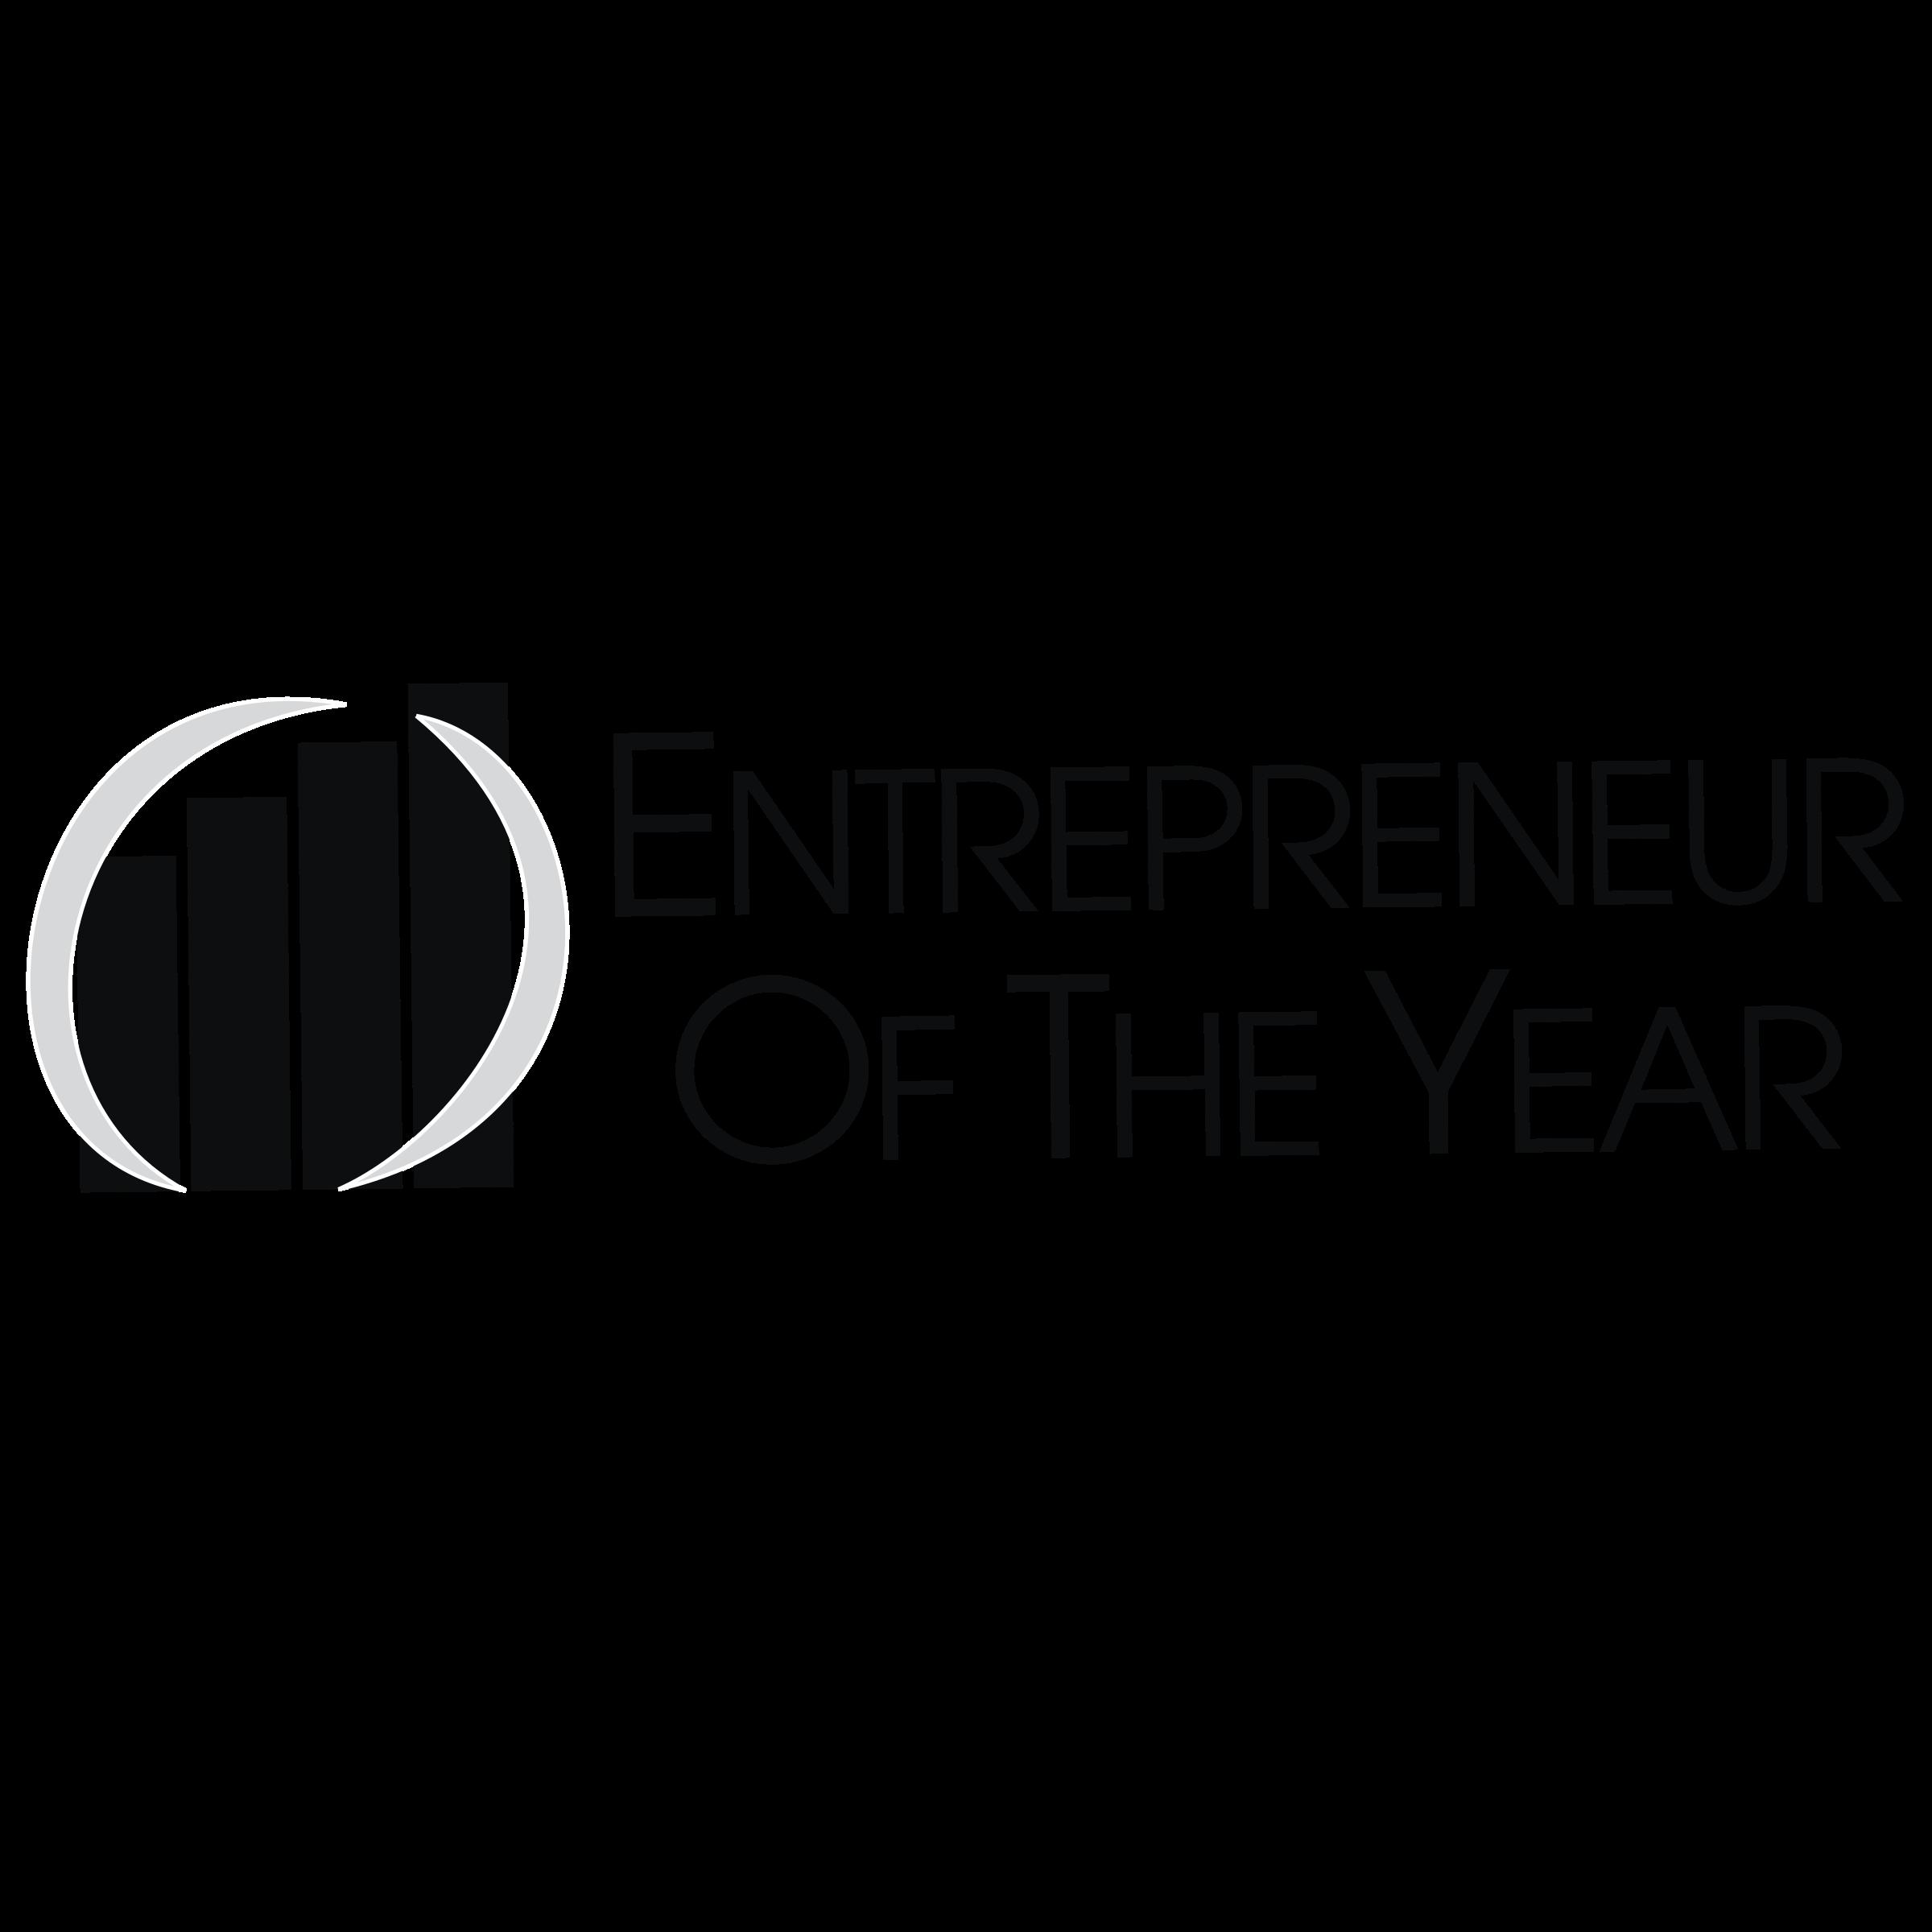 Entrepreneur Of The Year Logo PNG Transparent & SVG Vector.